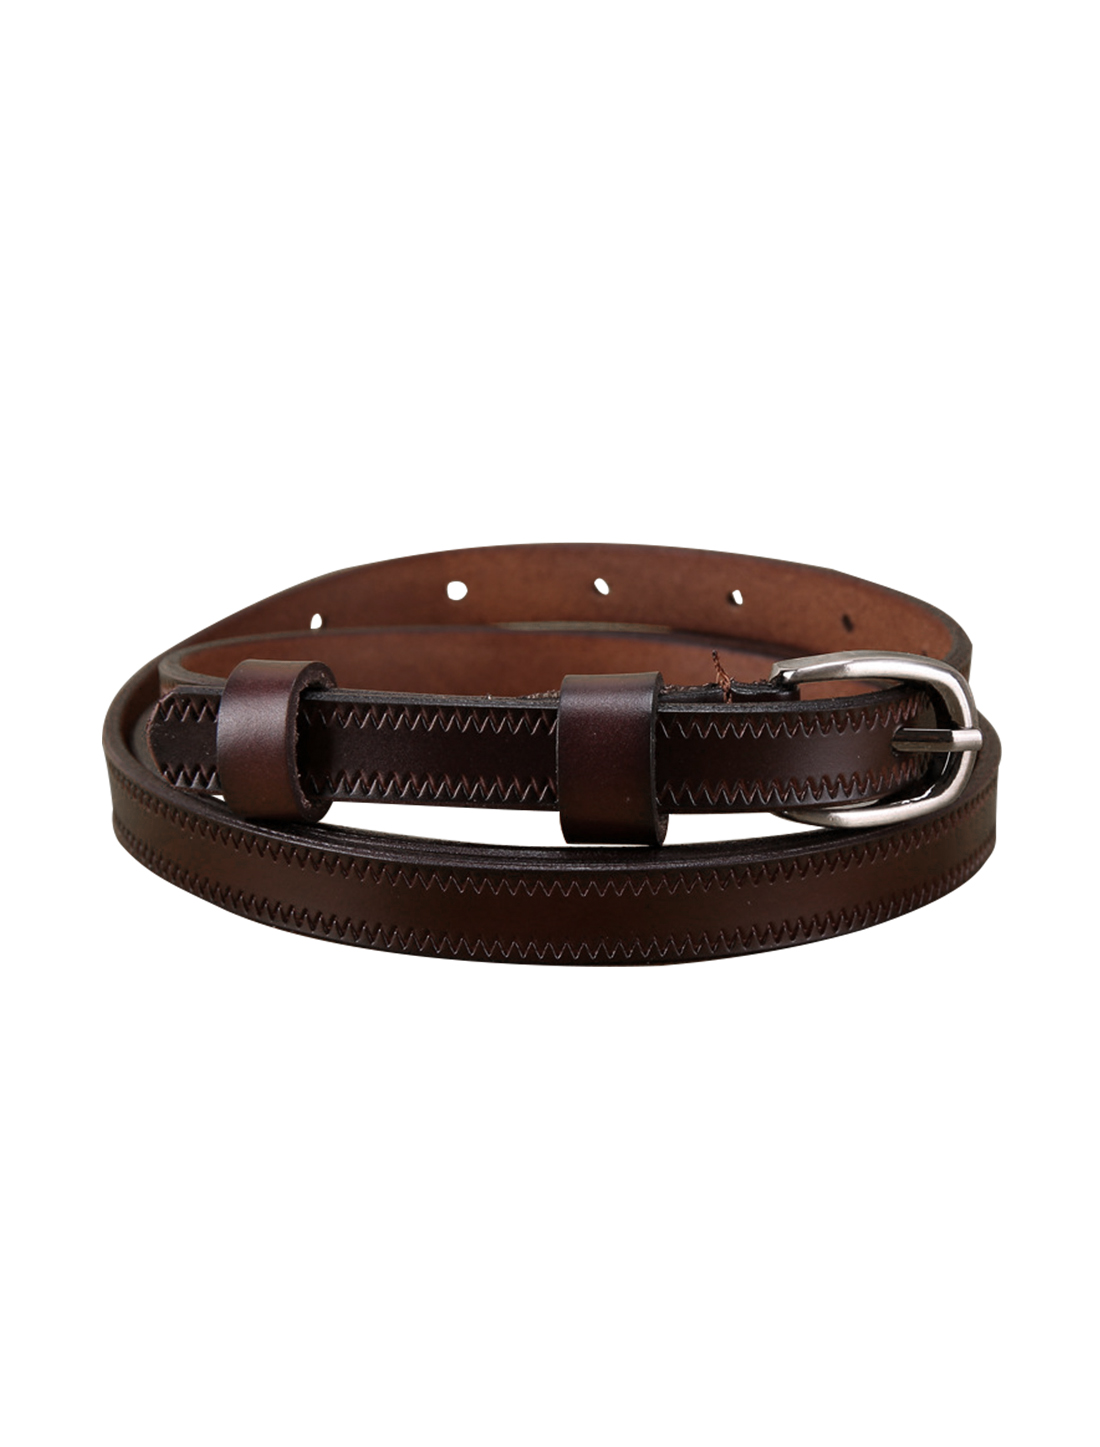 "Women Embossed Single Pin Buckle Leather Thin Belt Width 1/2"" Dark Brown"